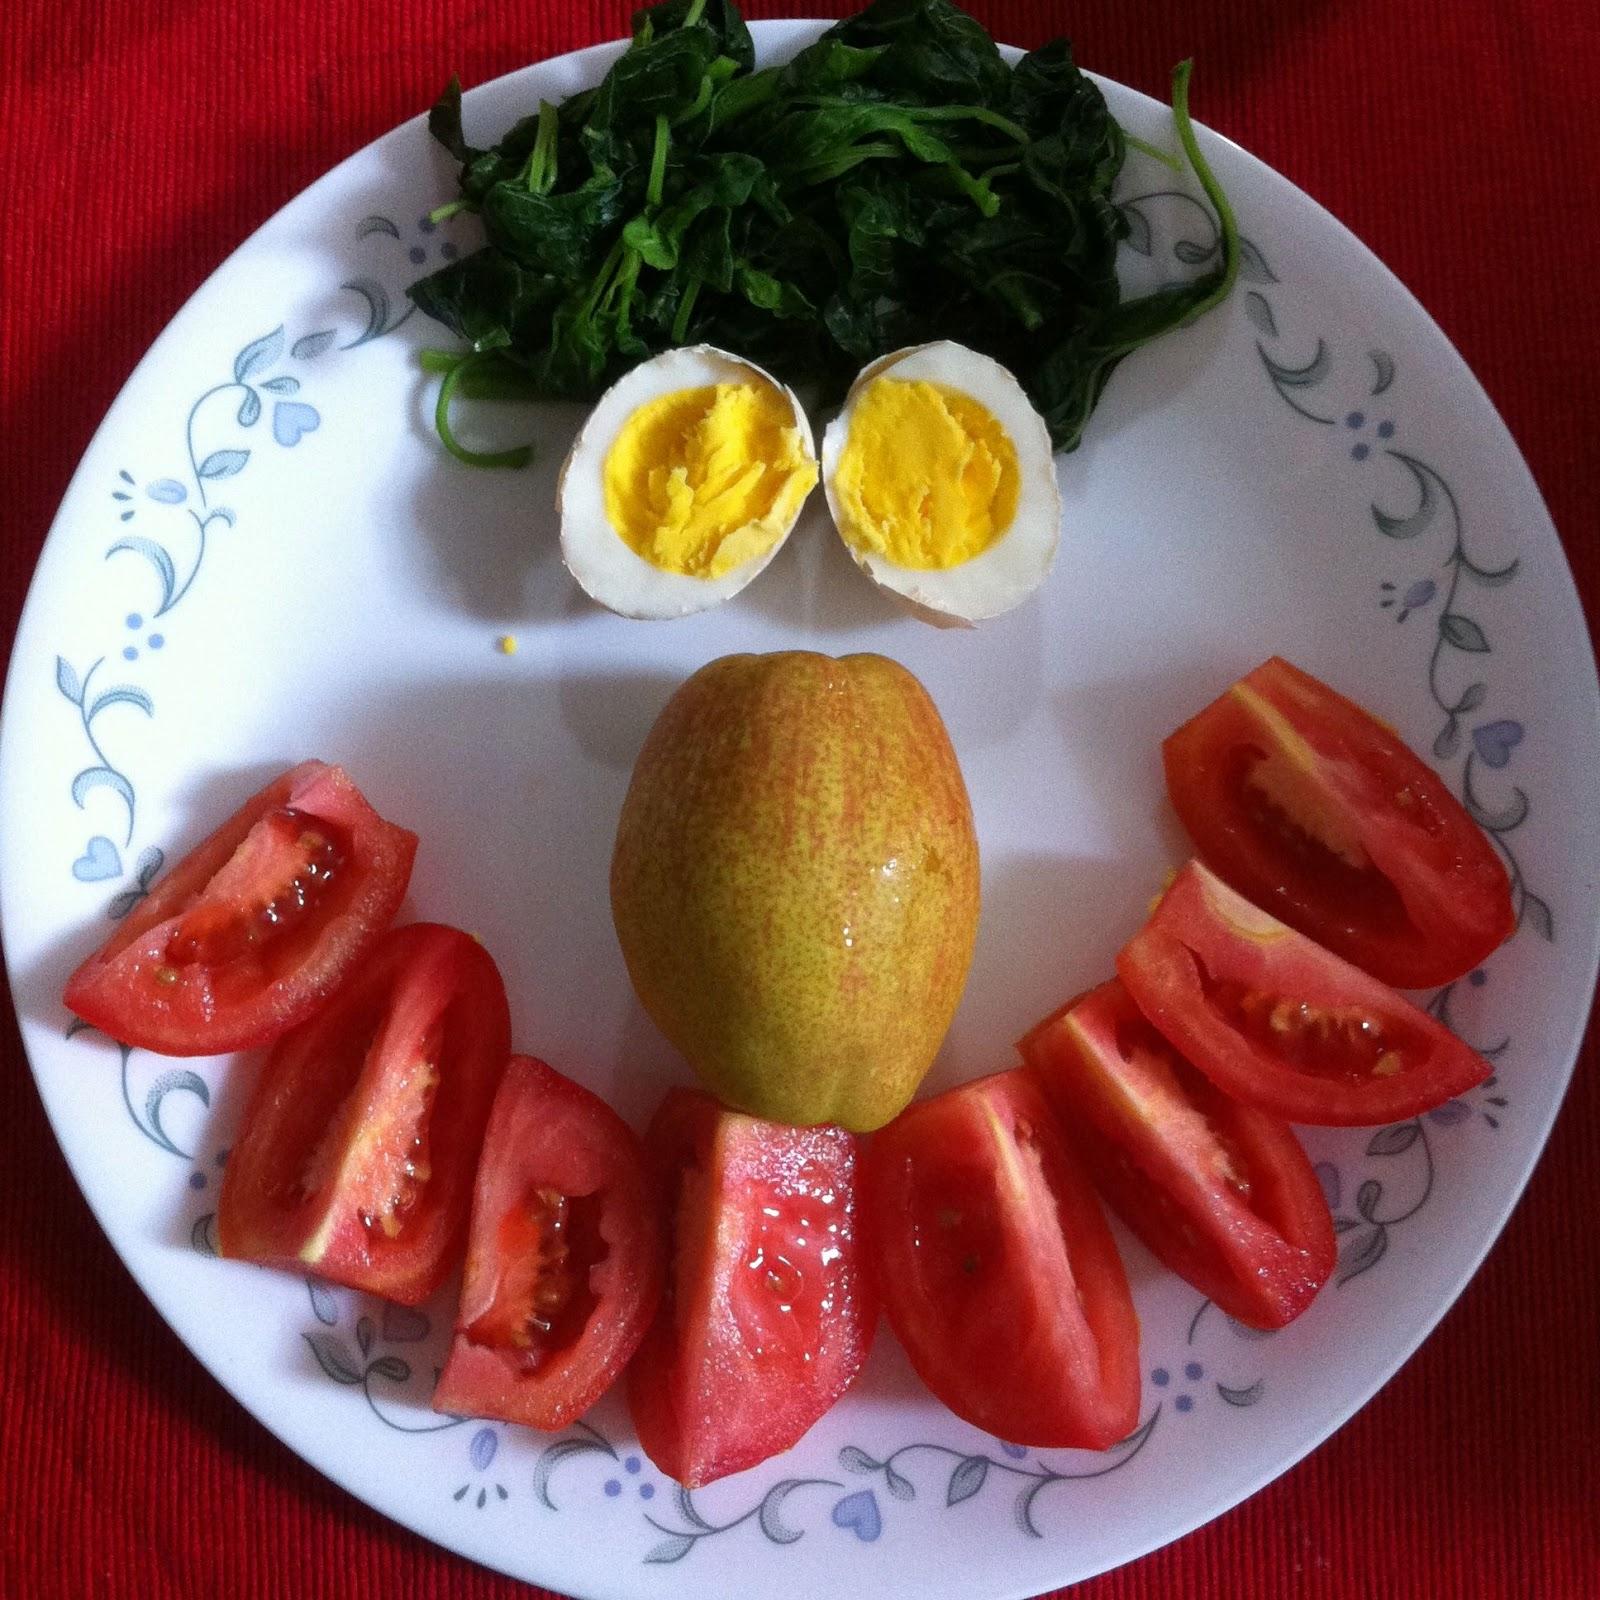 Pengalaman Diet Mayo: 13 Hari Turun 4,5 Kg Tanpa Olahraga